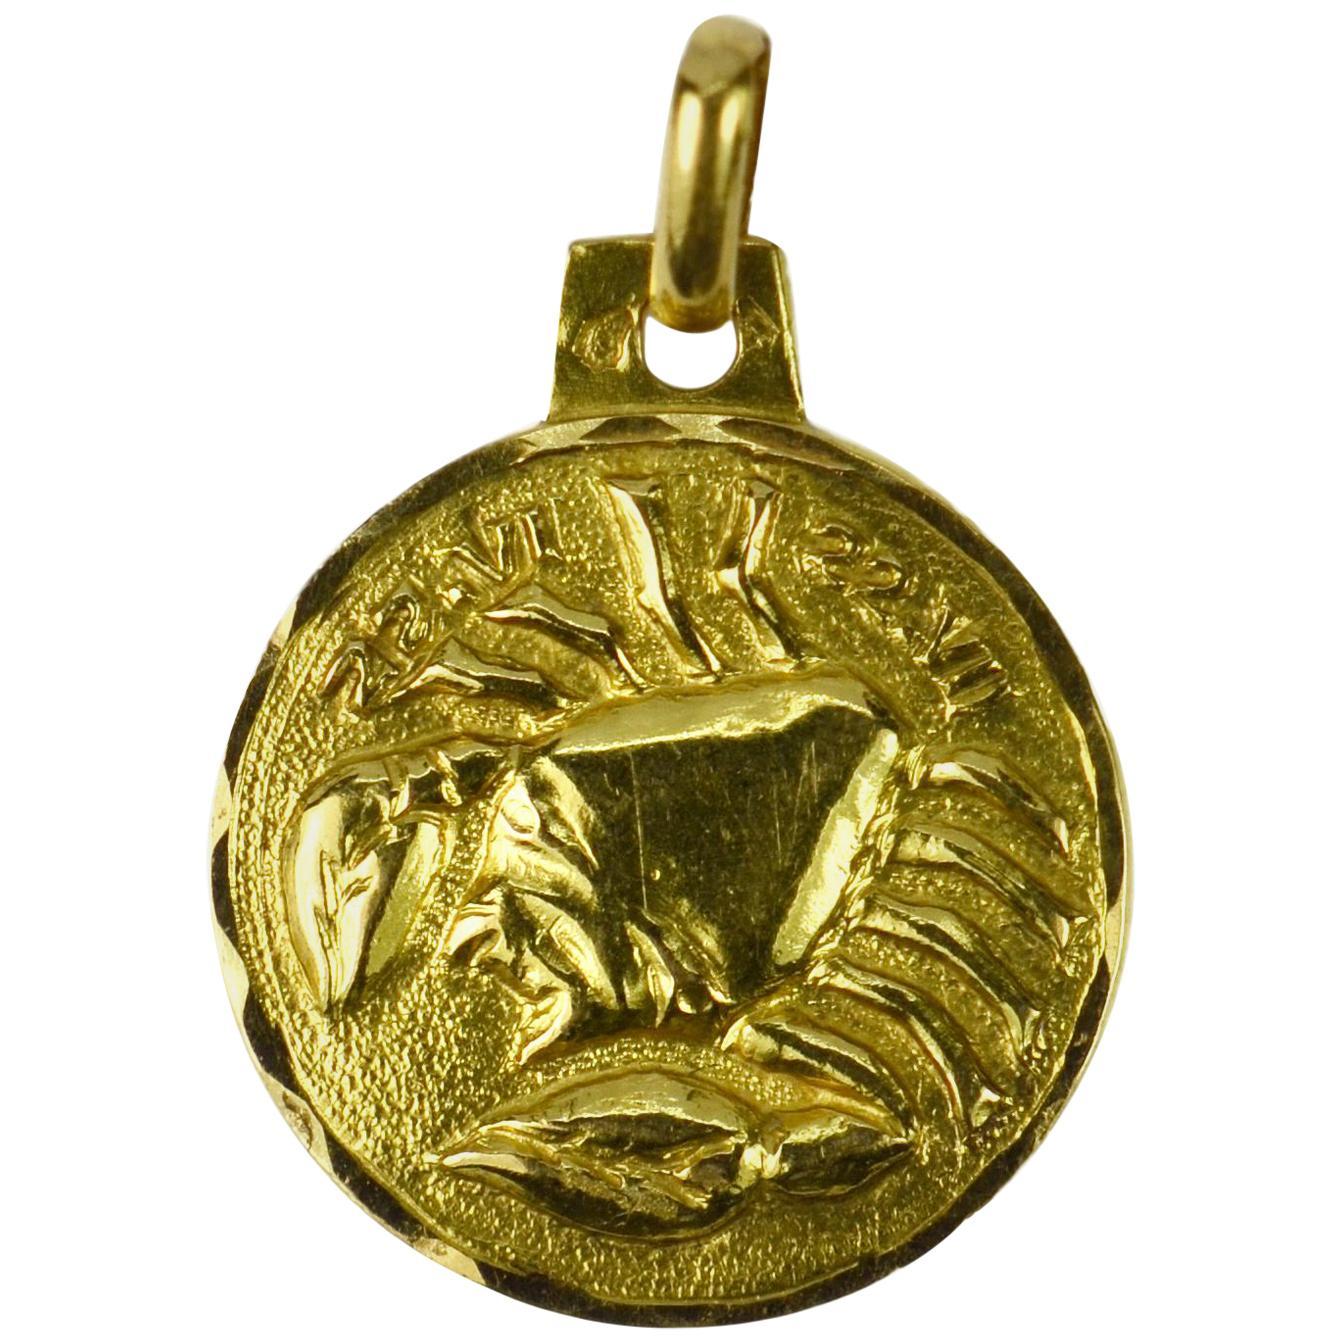 French 18 Karat Yellow Gold Zodiac Cancer Charm Pendant